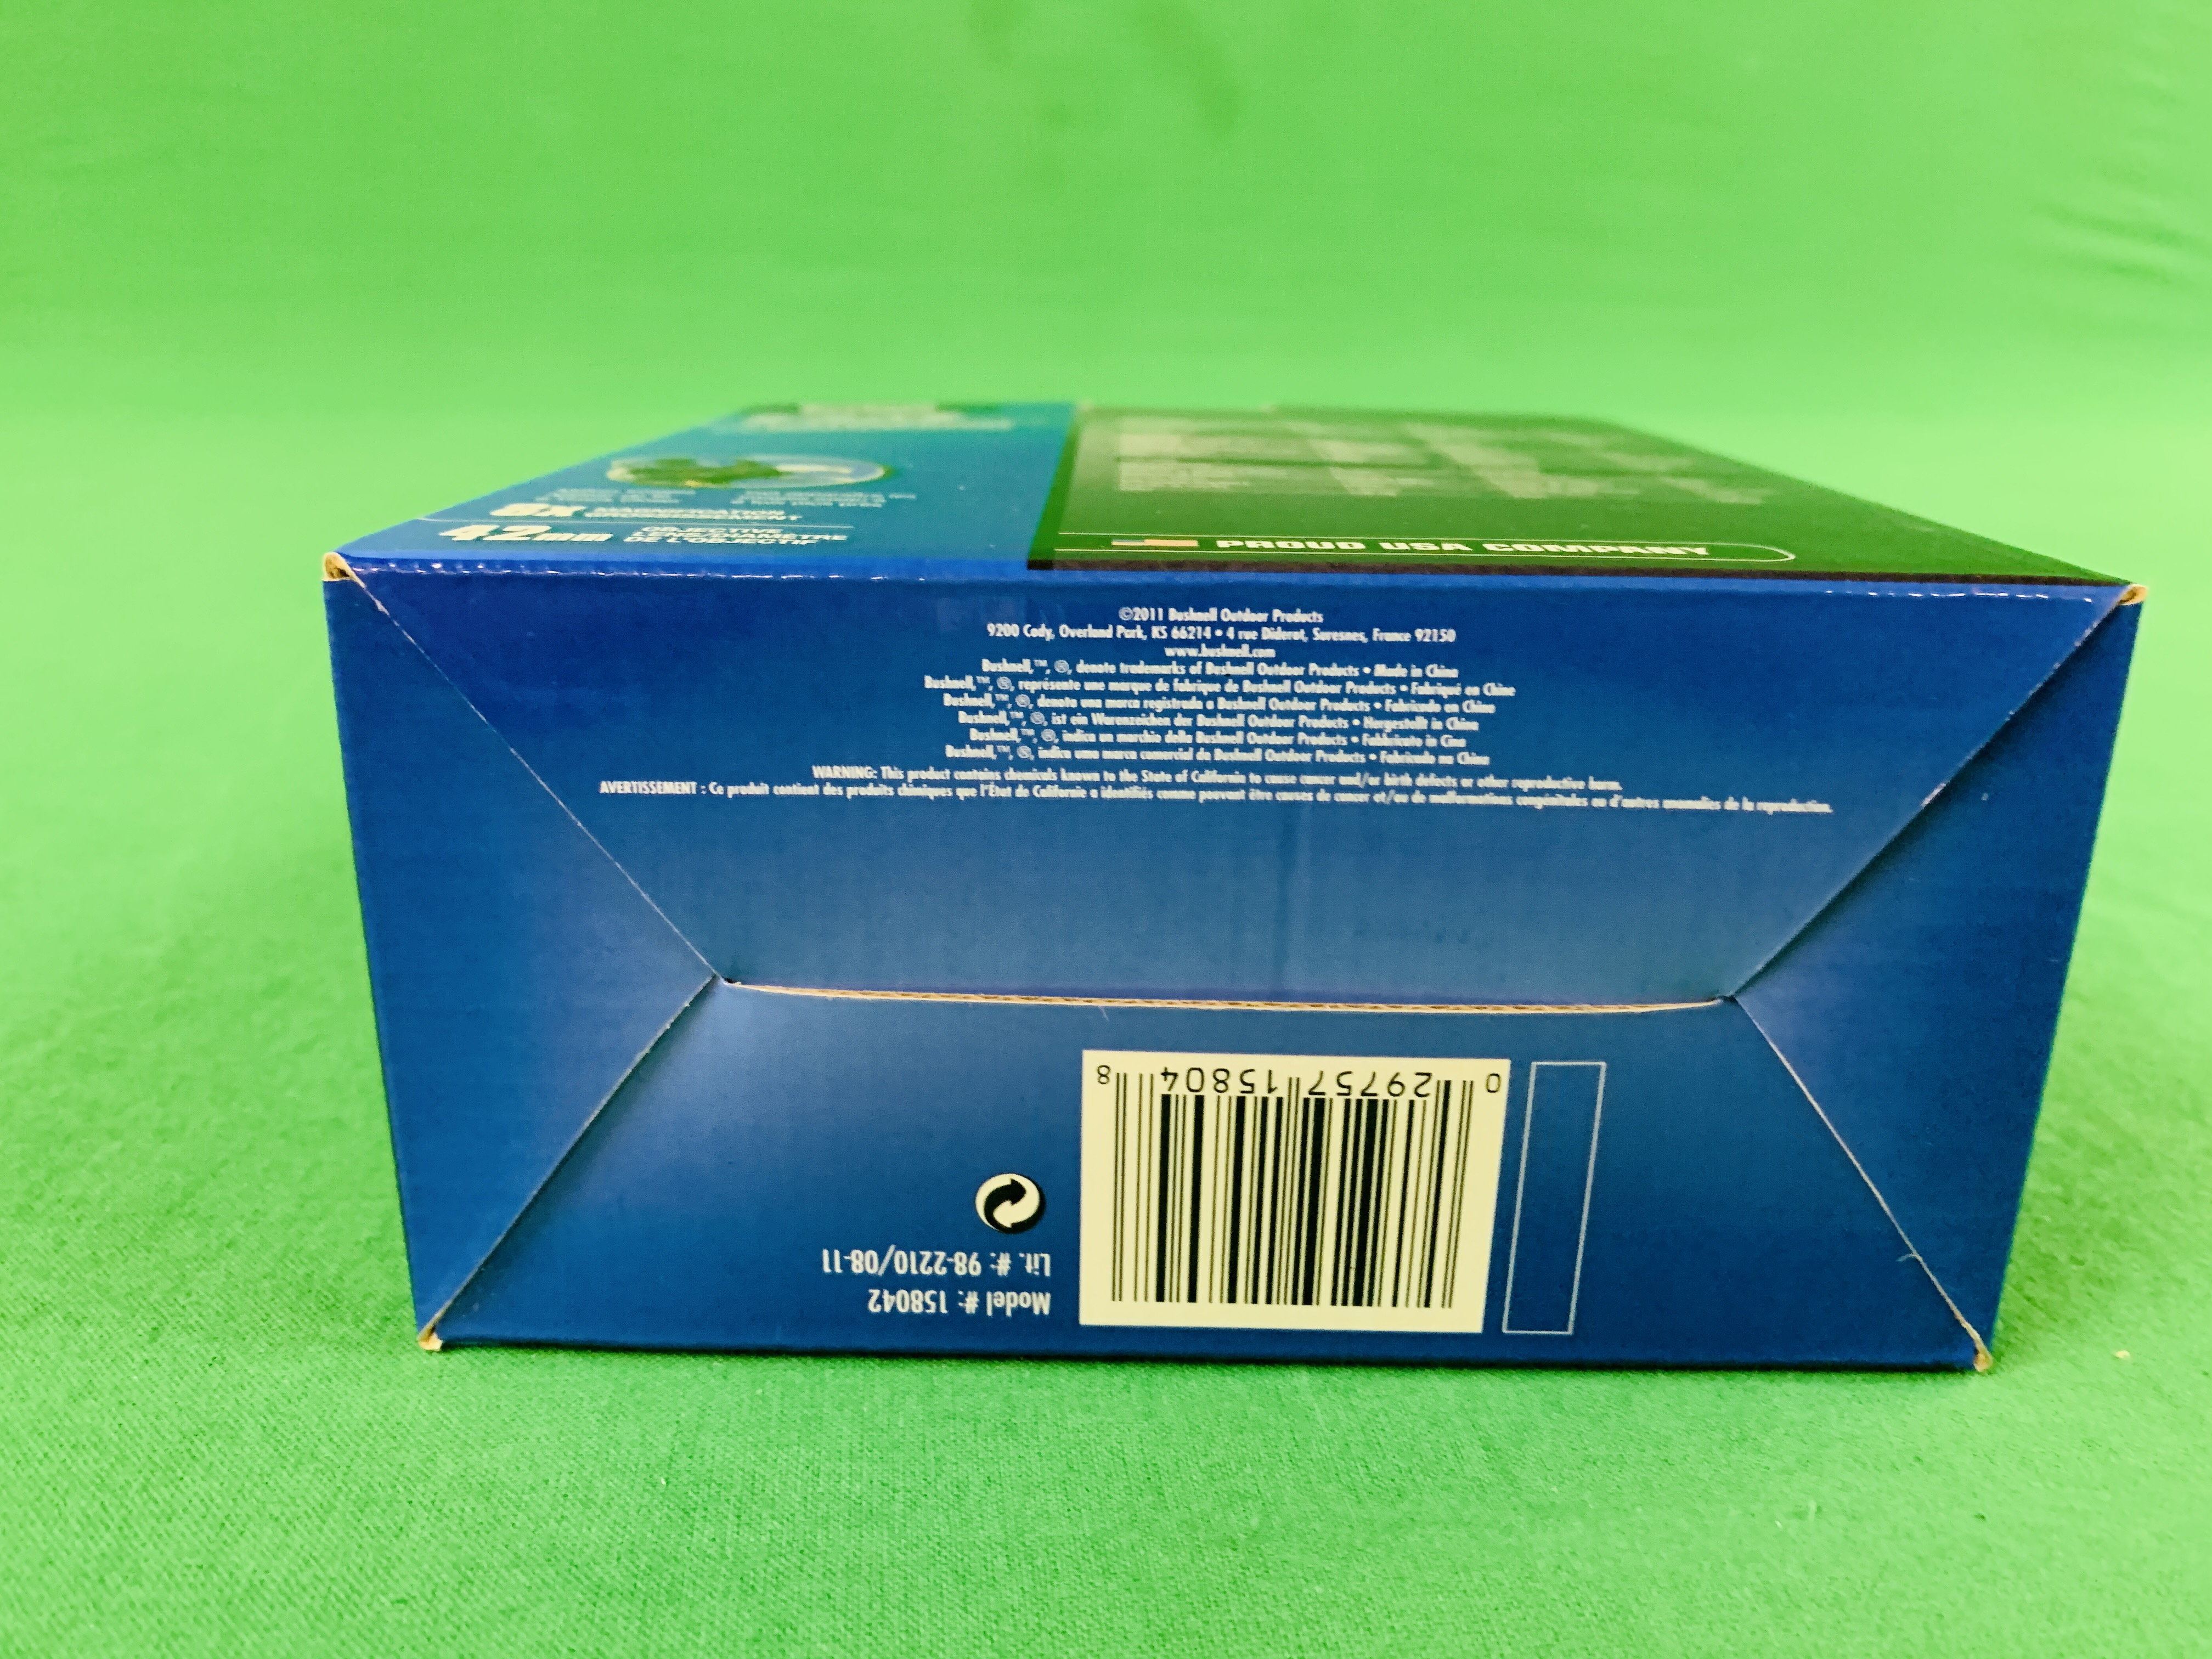 BUSHNELL H20 WATERPROOF 8 X 42 MM BINOCULARS - Image 6 of 6